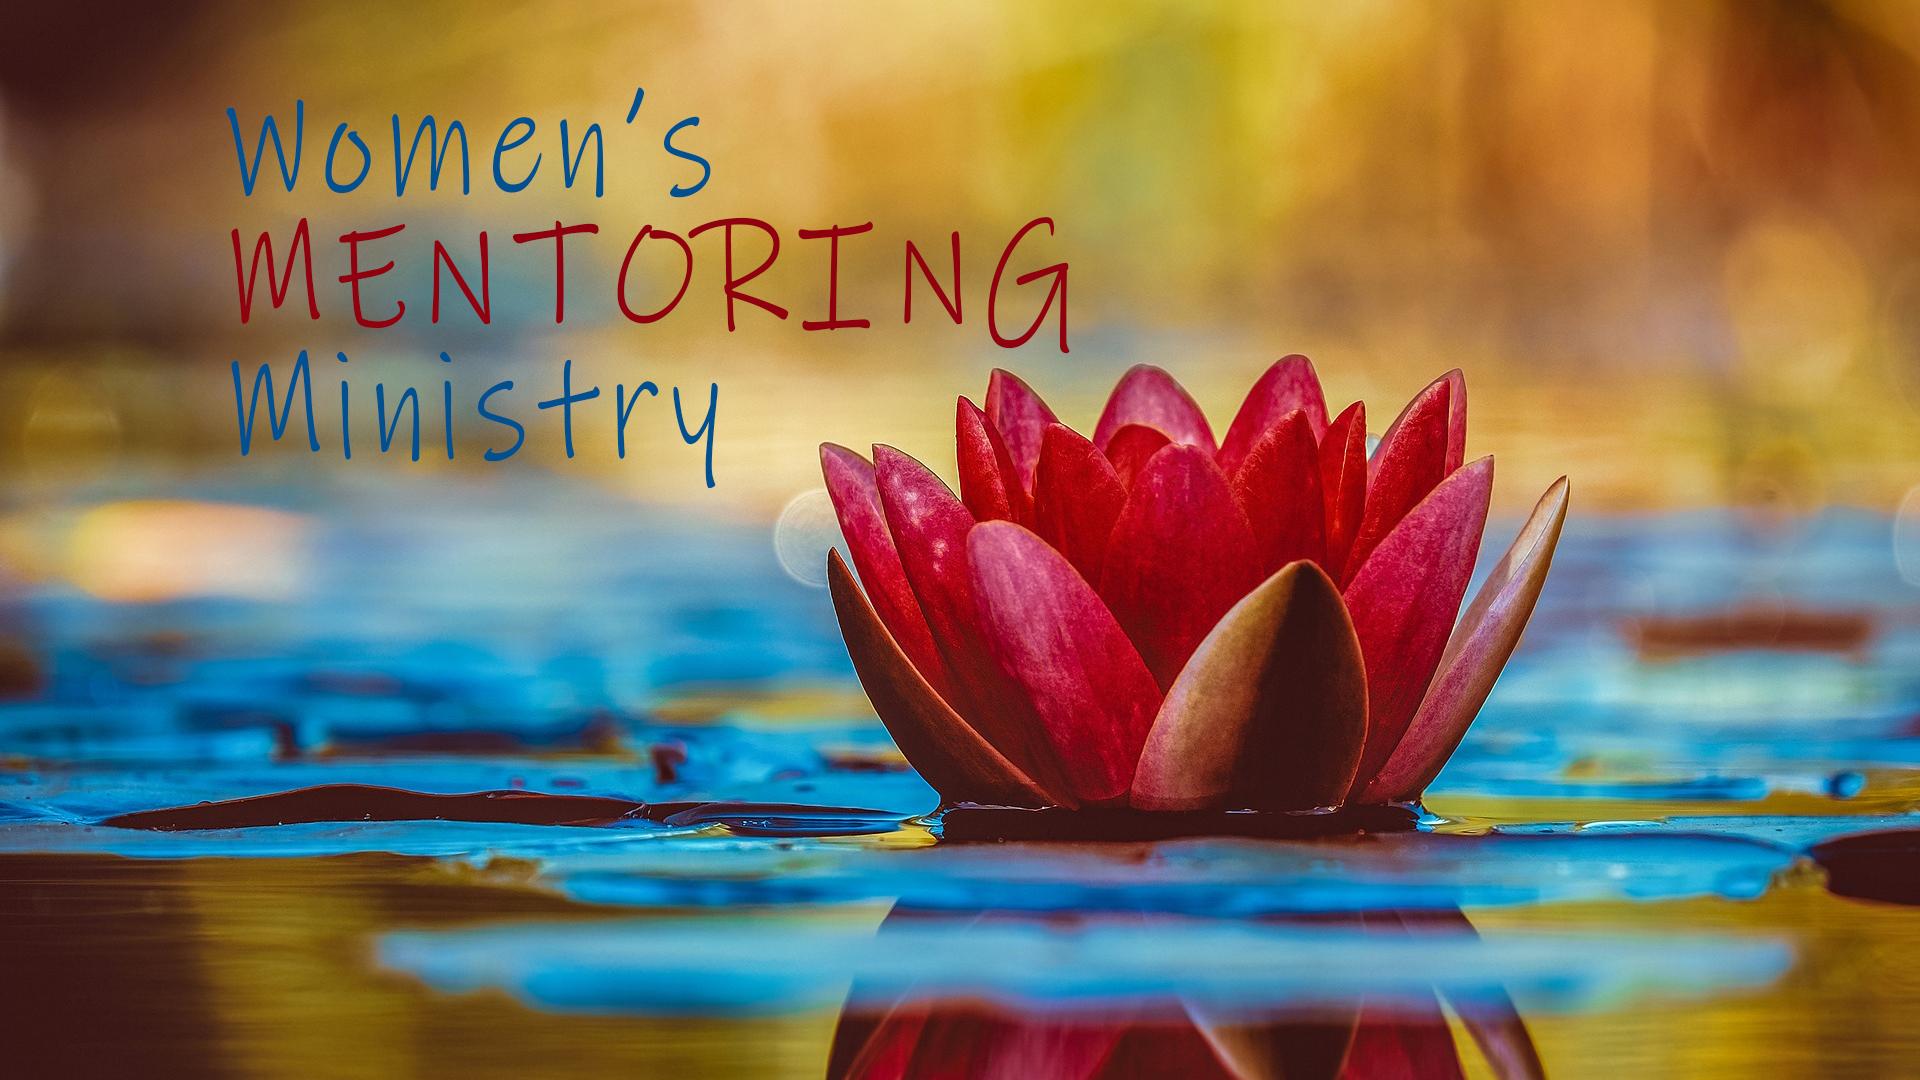 Adults_Women's Mentoring Ministry.jpg